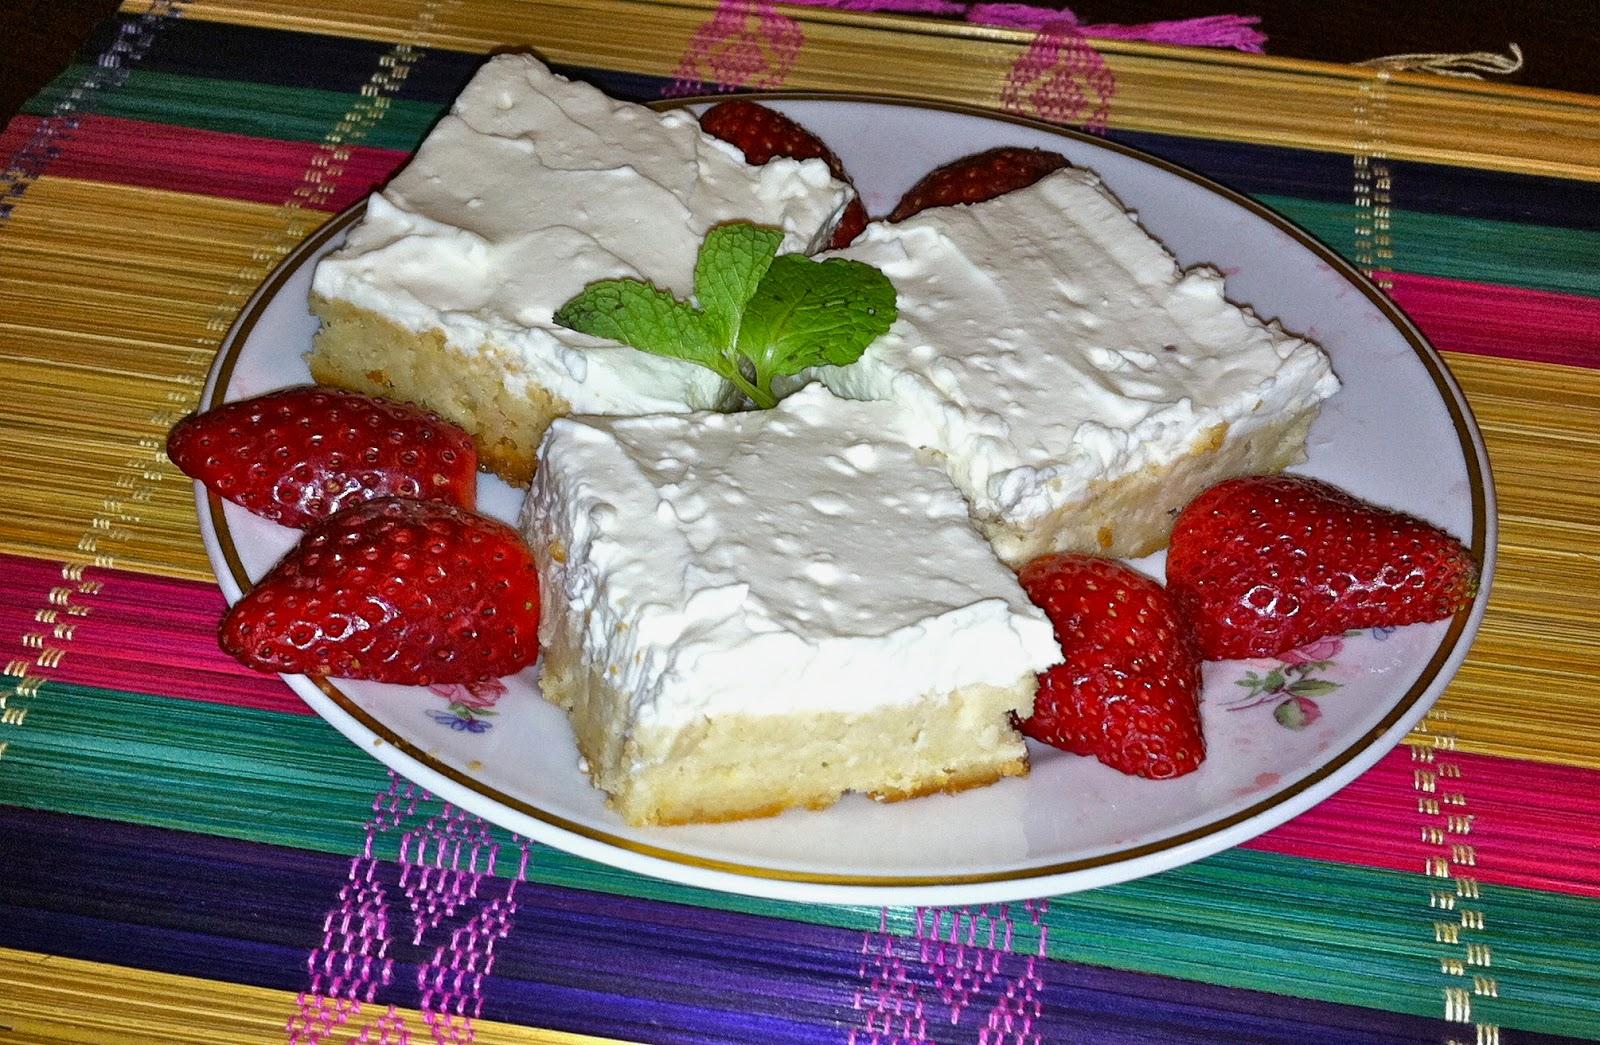 Atkins Low Carb Cake Recipes: Atkins Phase